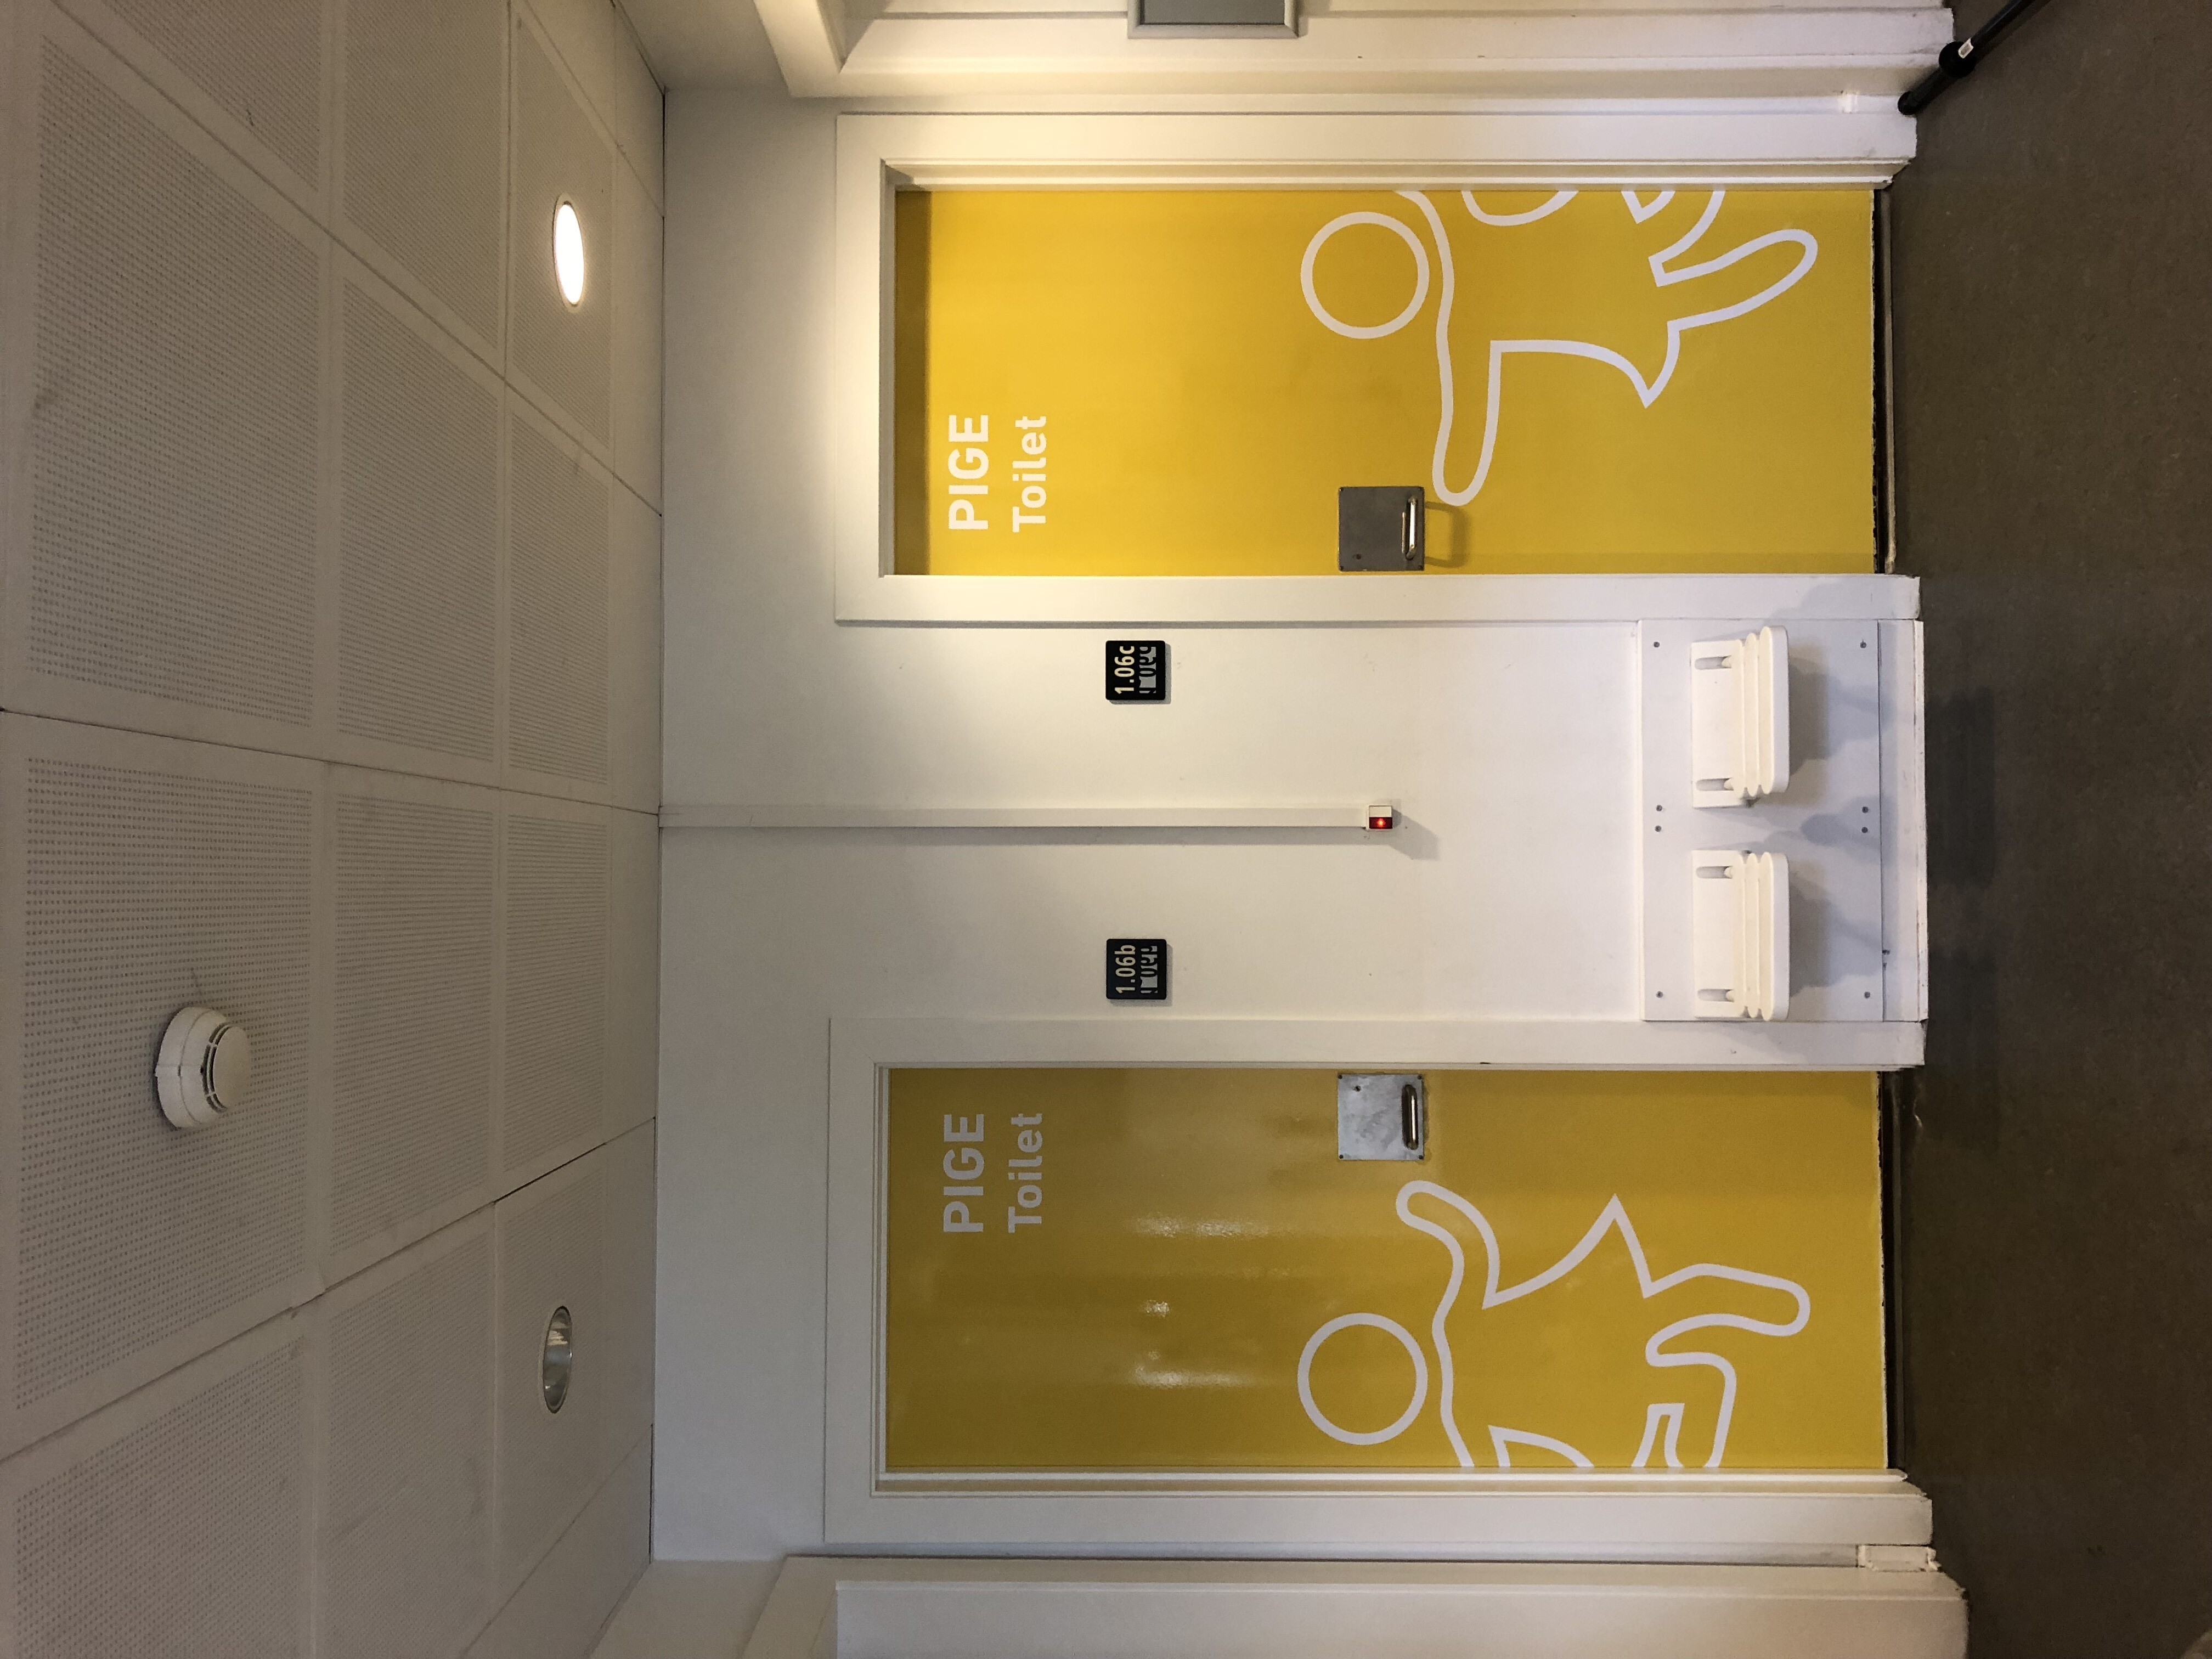 Toiletdør1